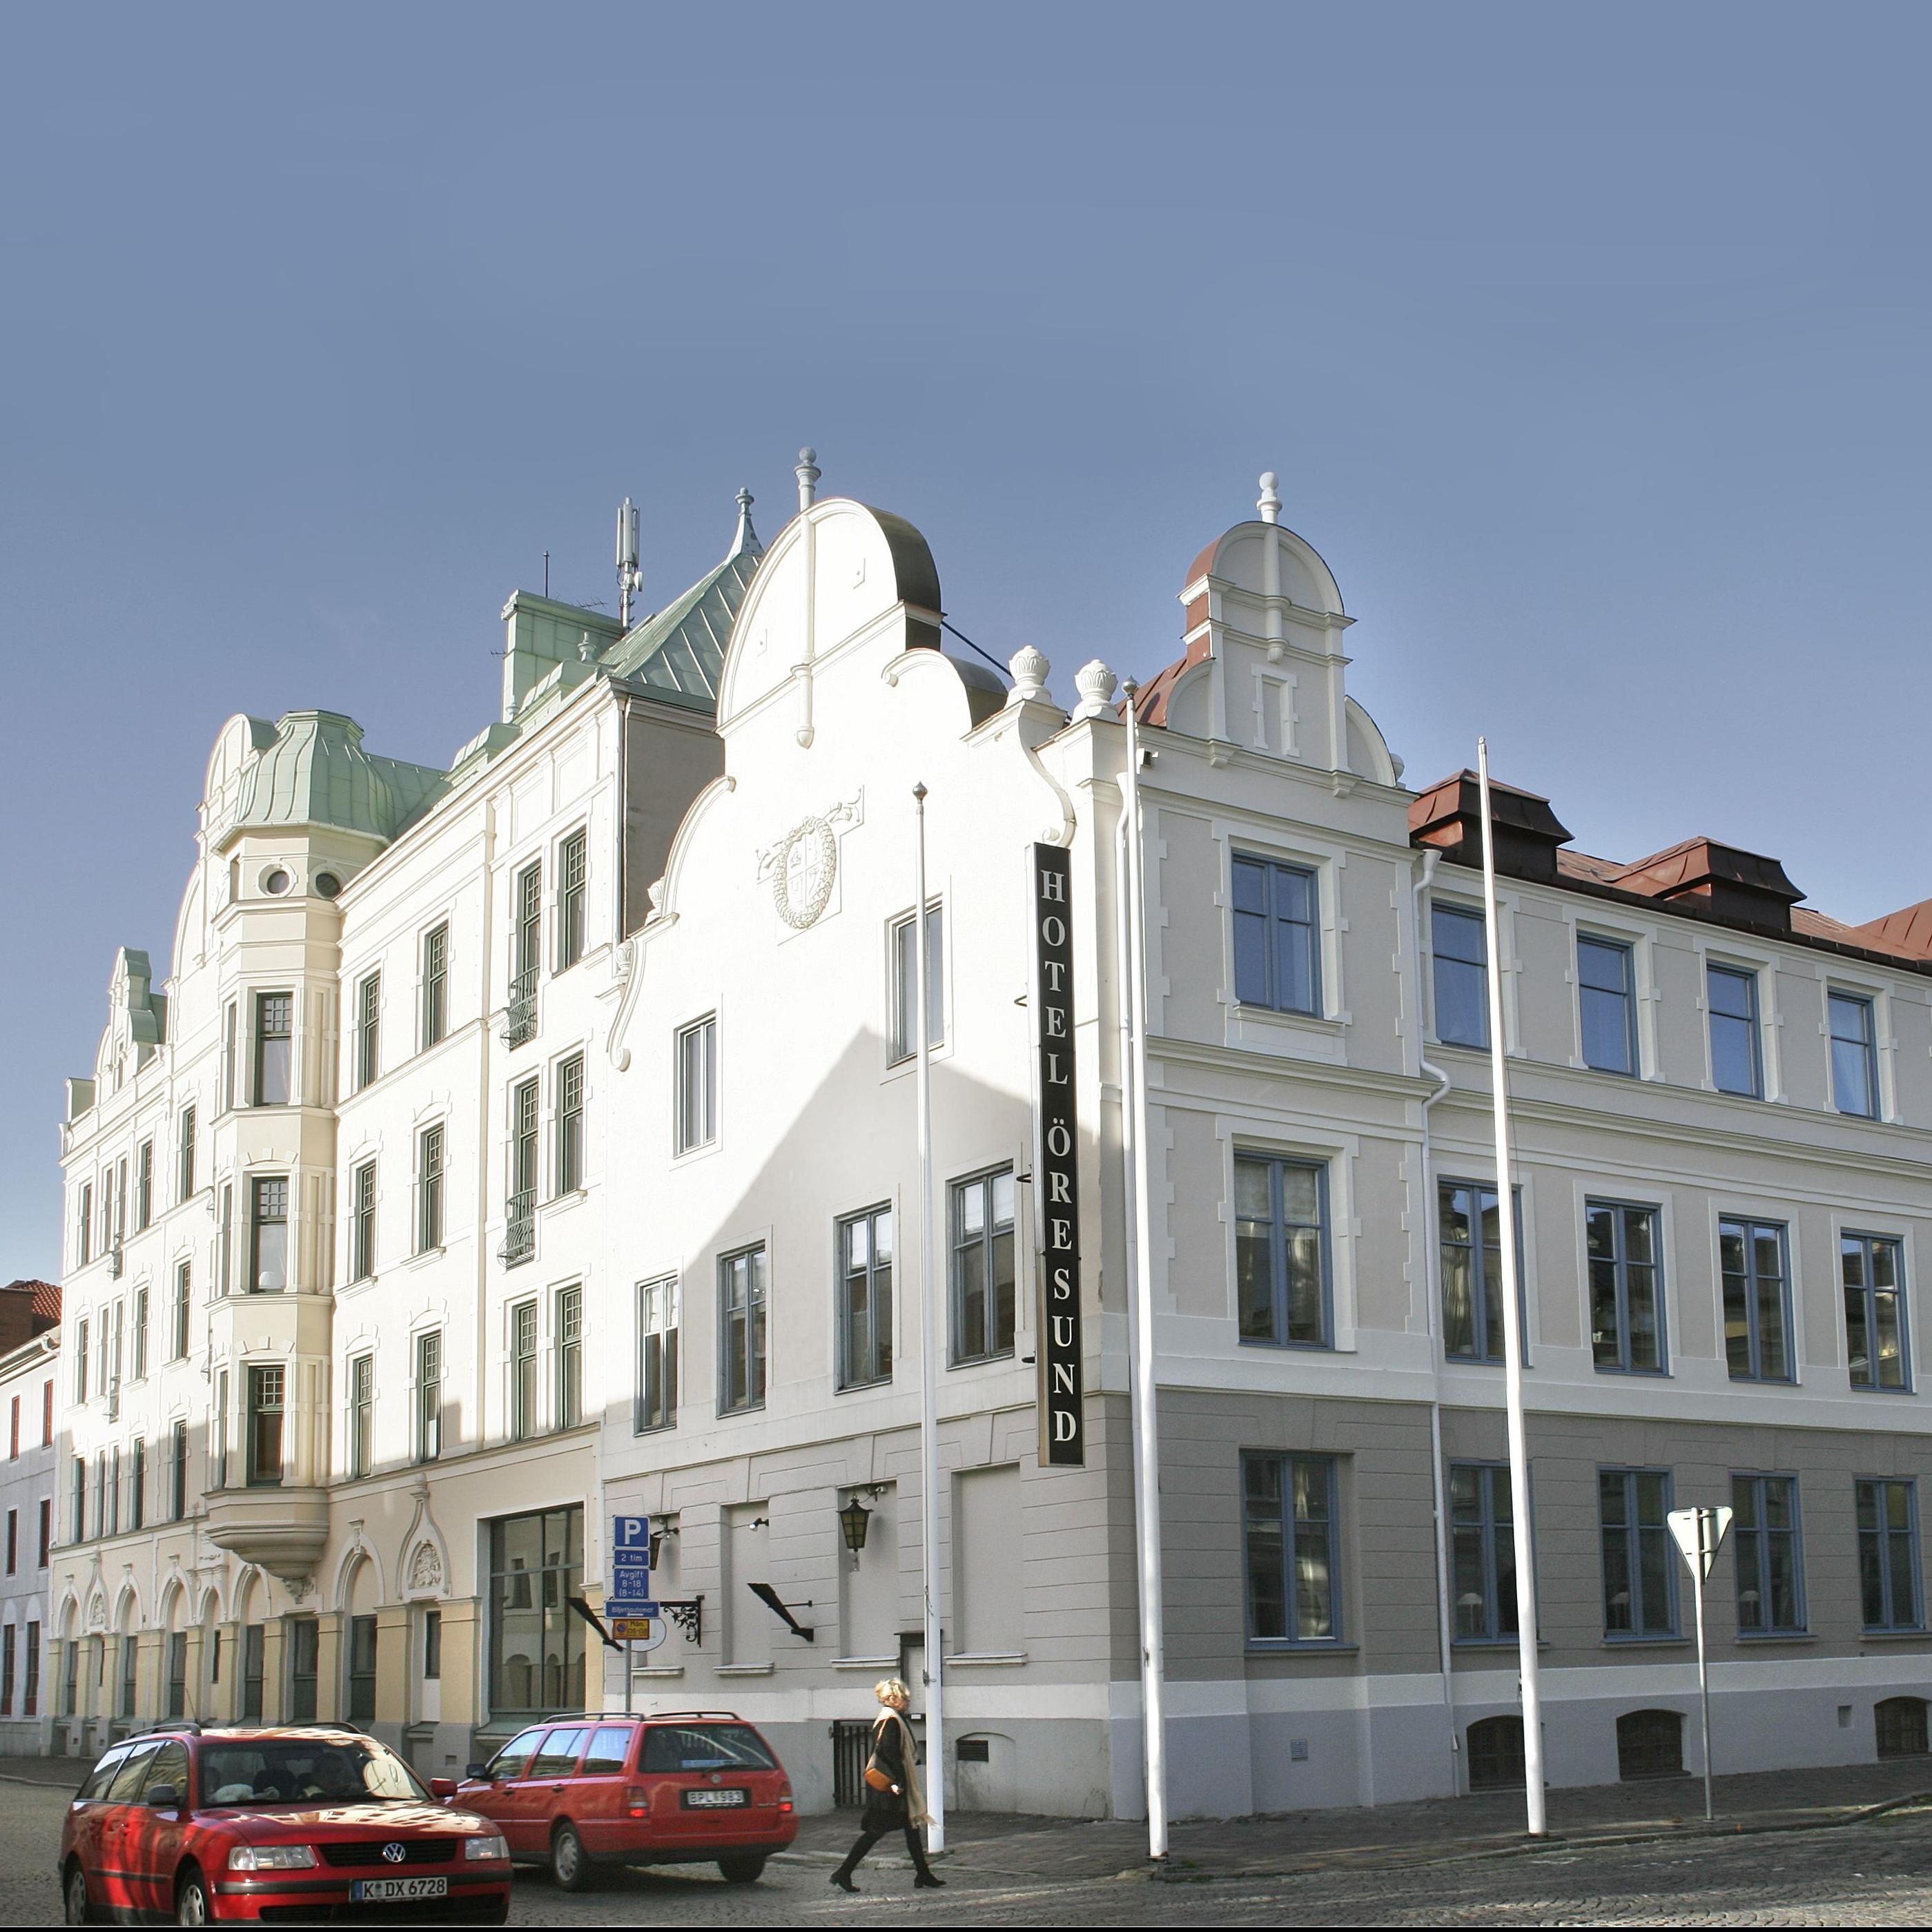 Hotel Öresund,  © Hotel Öresund, Hotel Öresund